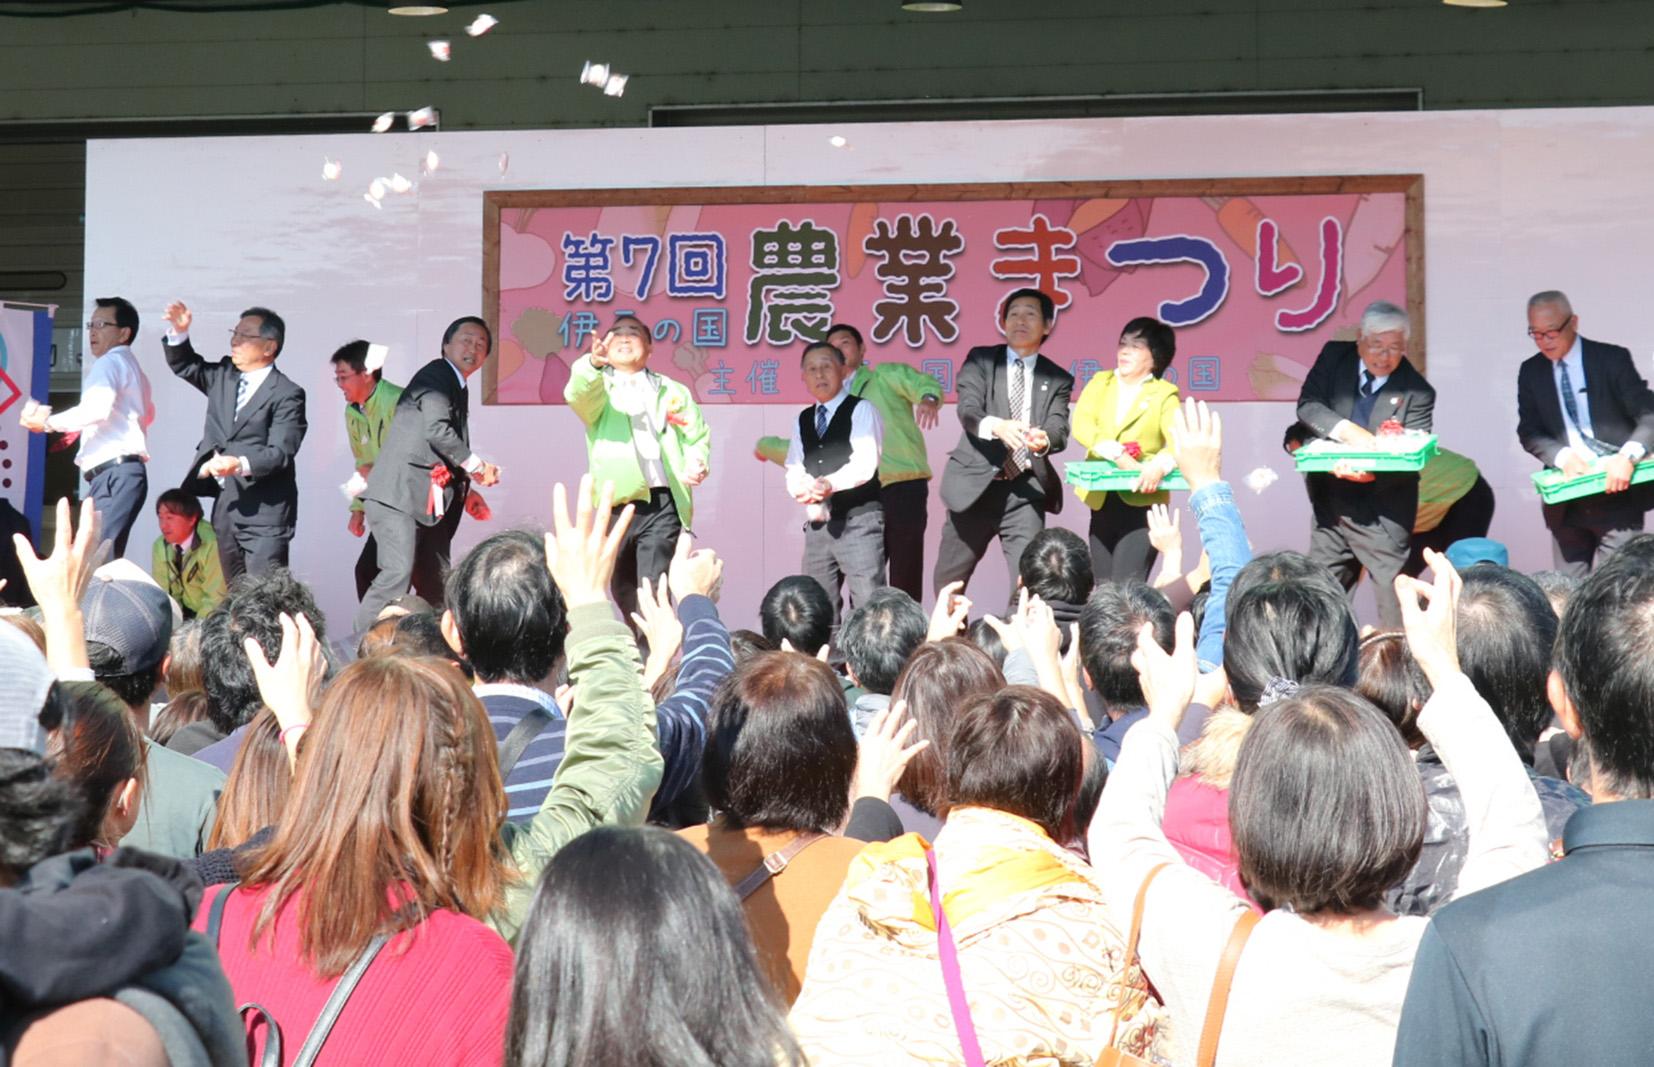 JAまつり 韮山会場(伊豆の国農業まつりを合同開催)の写真